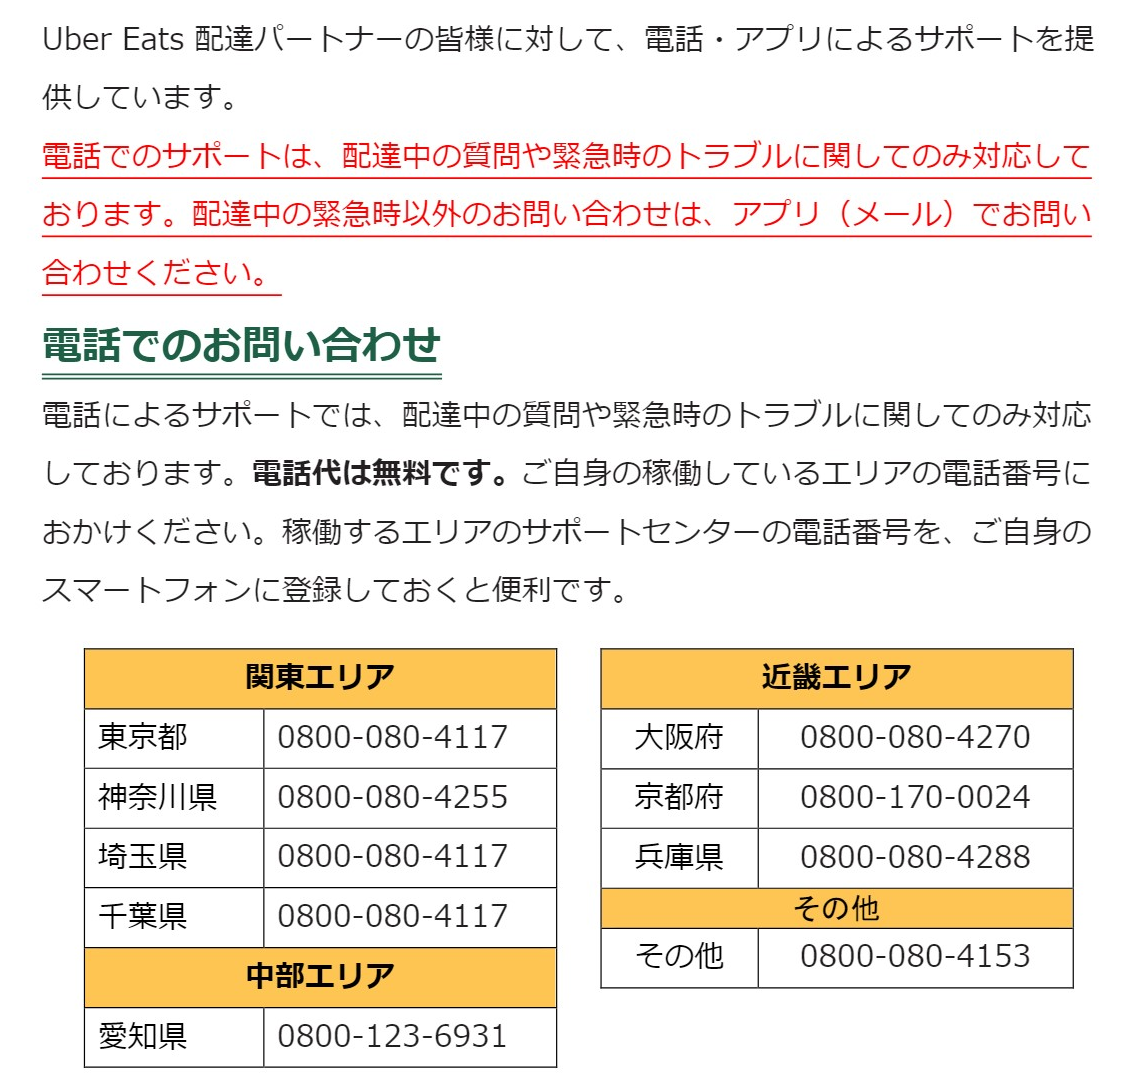 f:id:UberPartnerJP:20210429120607p:plain